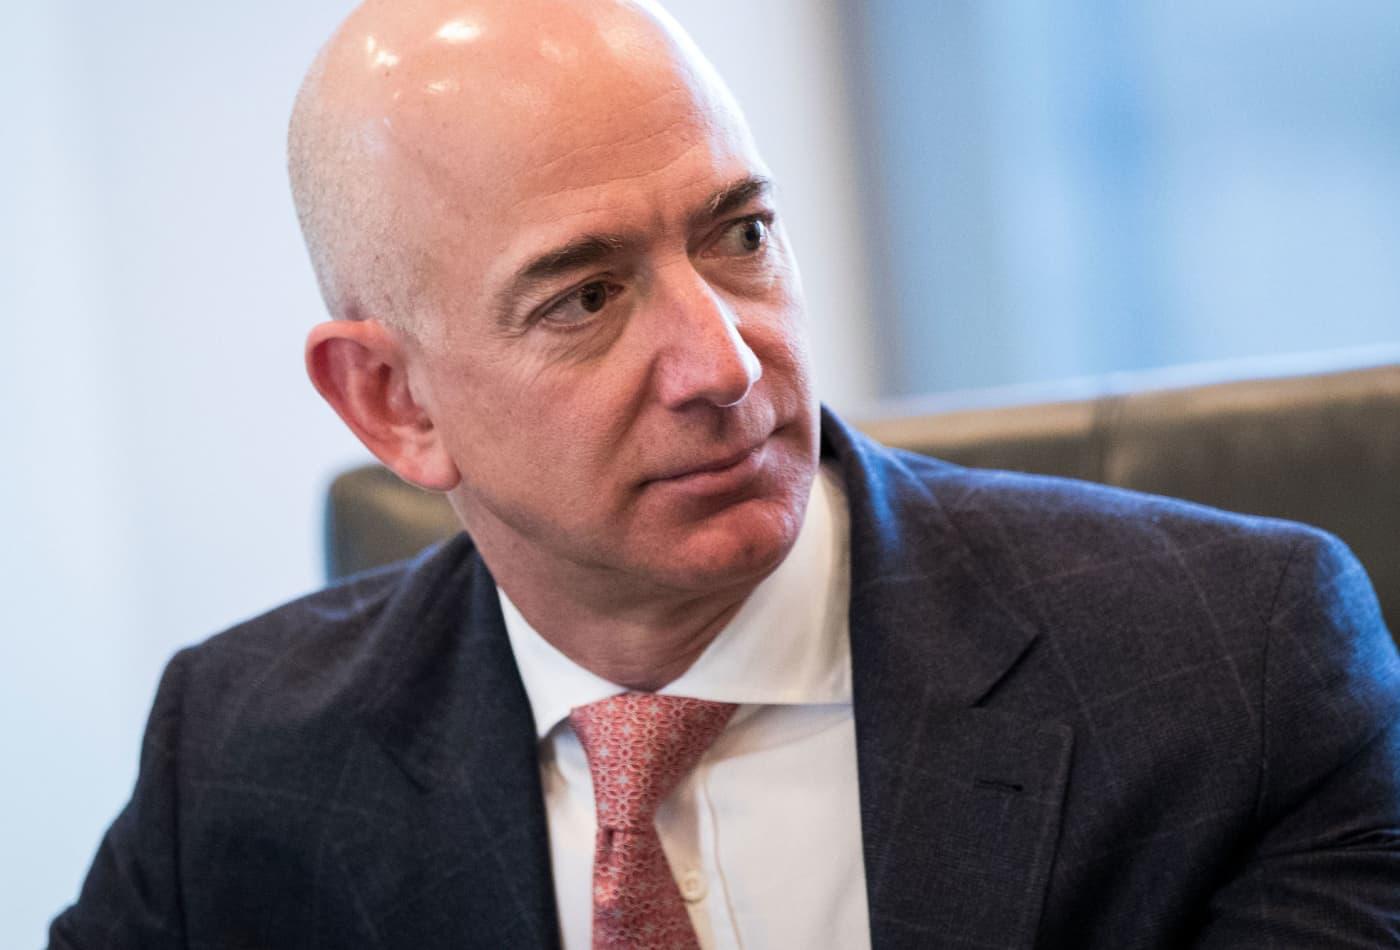 Amazon is hiring people to break into the multibillion-dollar pharmacy market